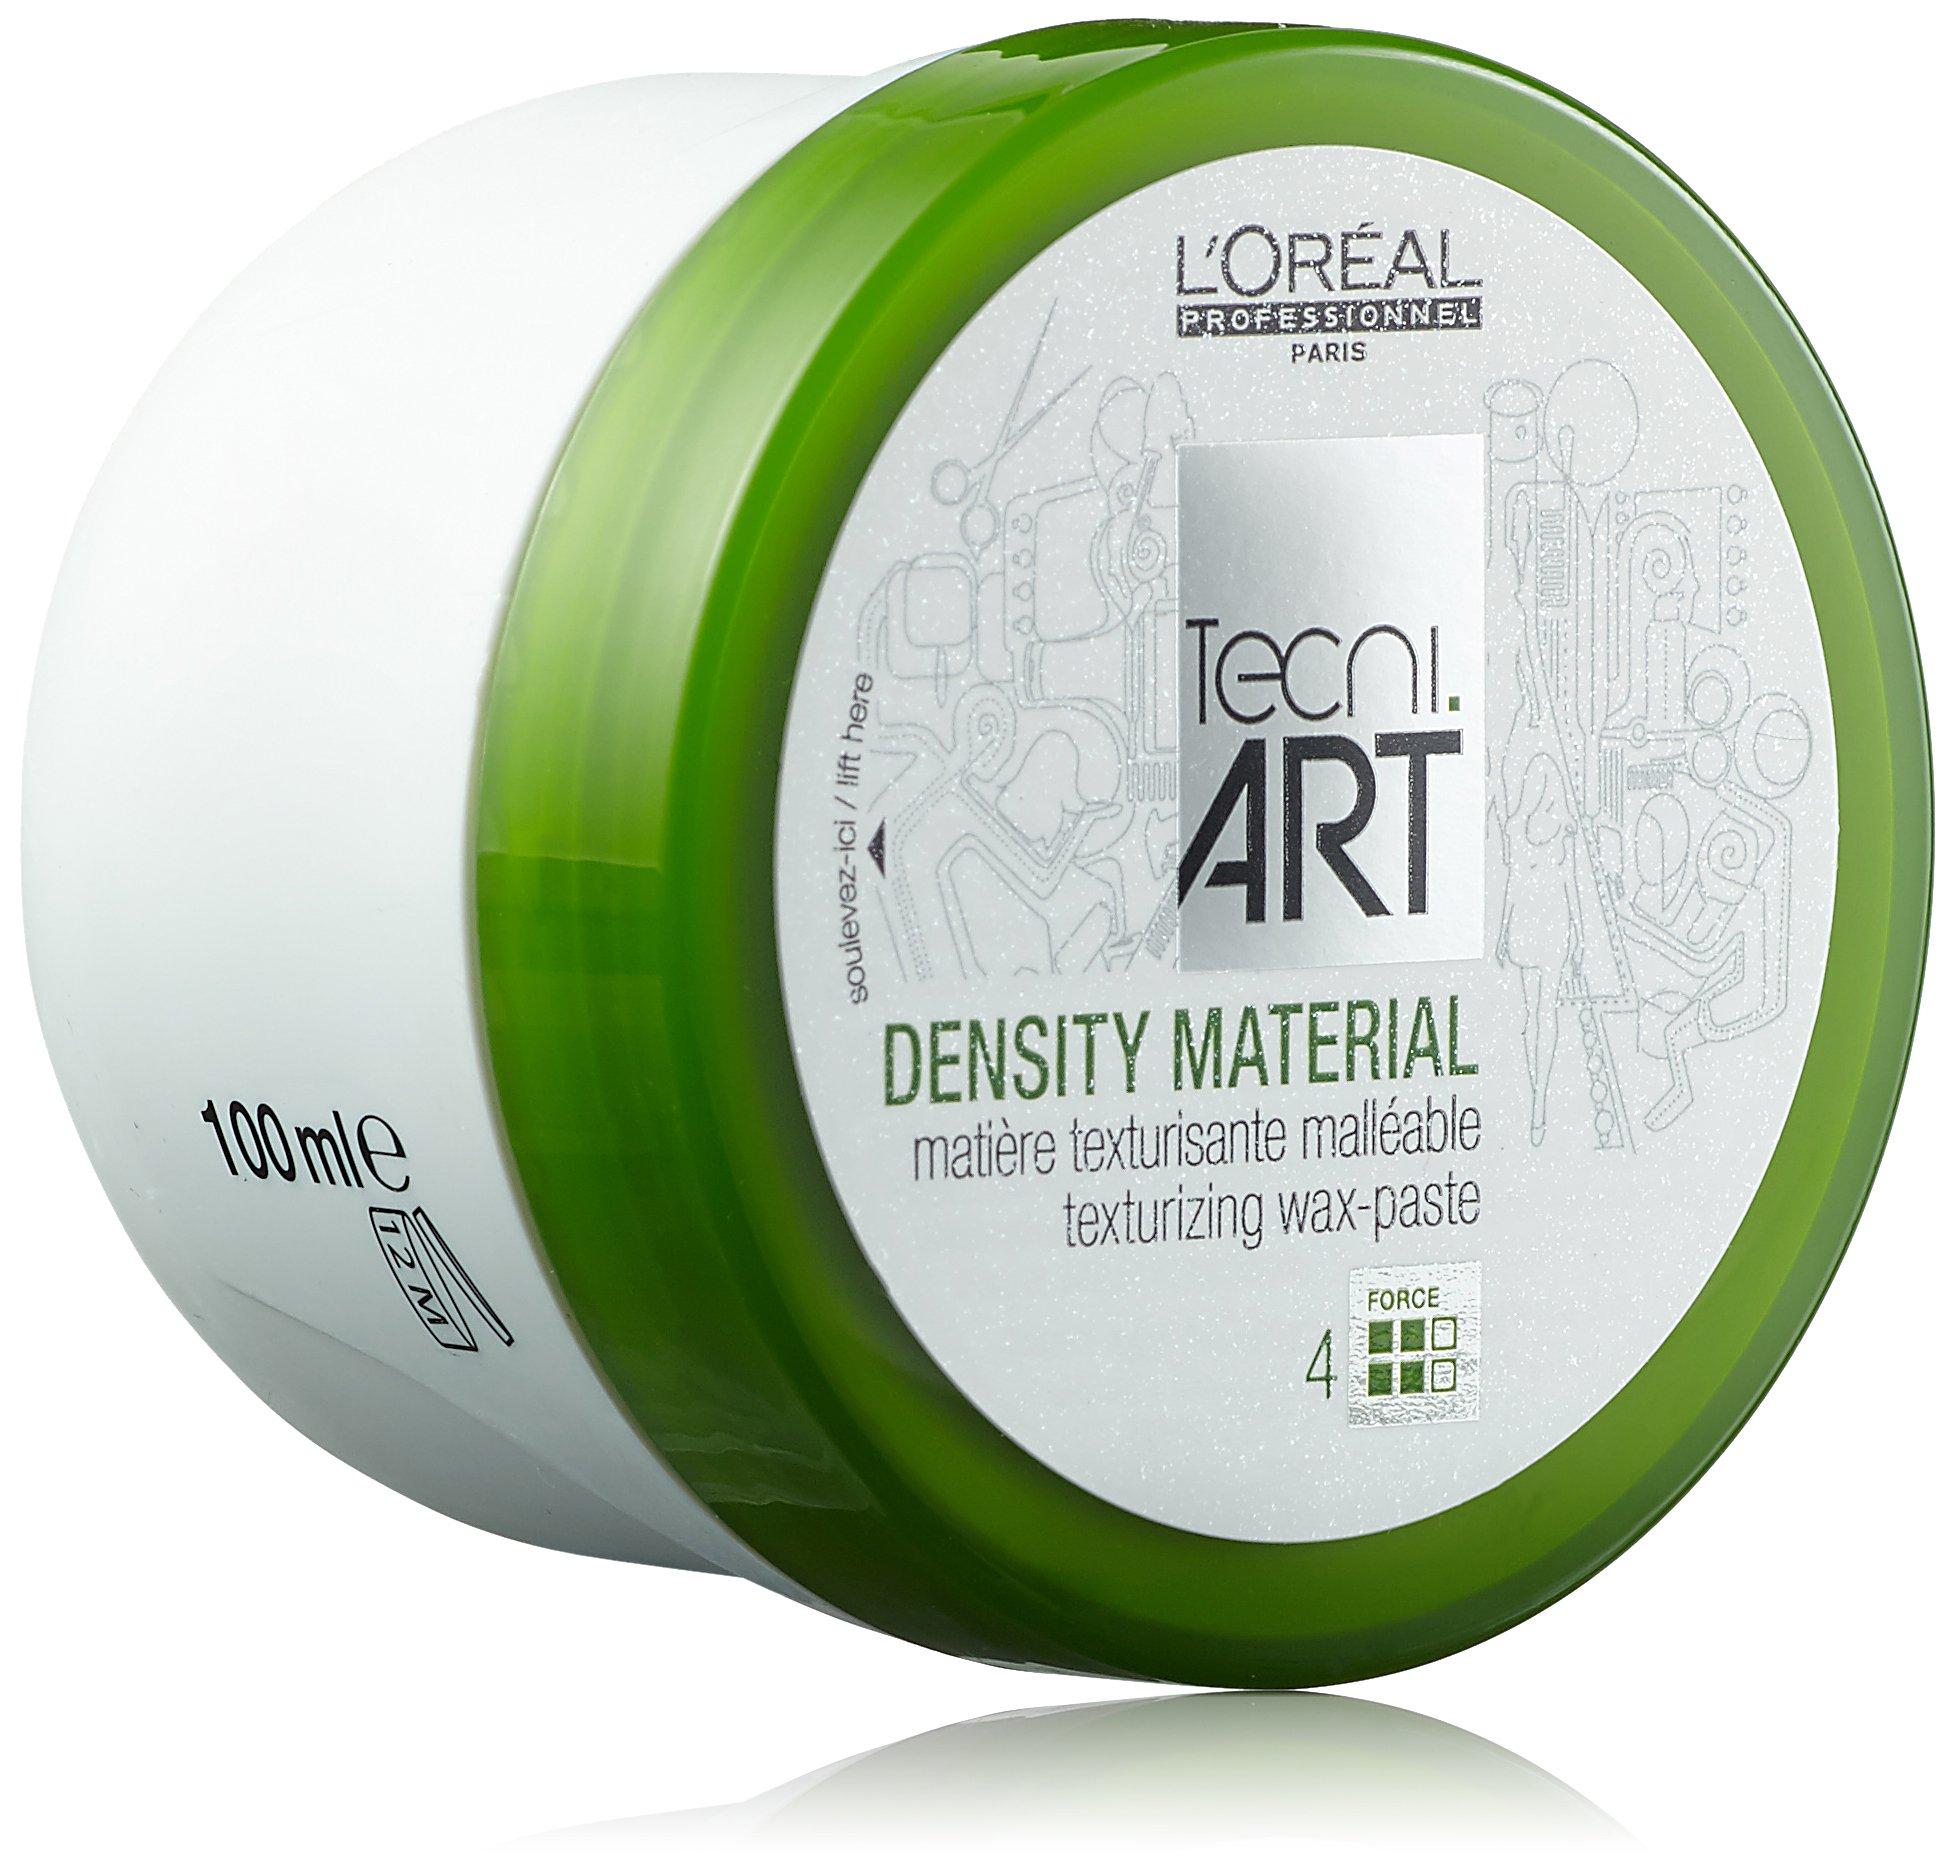 L'Oréal Paris Tecni Art 4 Density Material Wax-Paste gel para el cabello 100 ml – Geles para el cabello (Unisex, 100 ml…